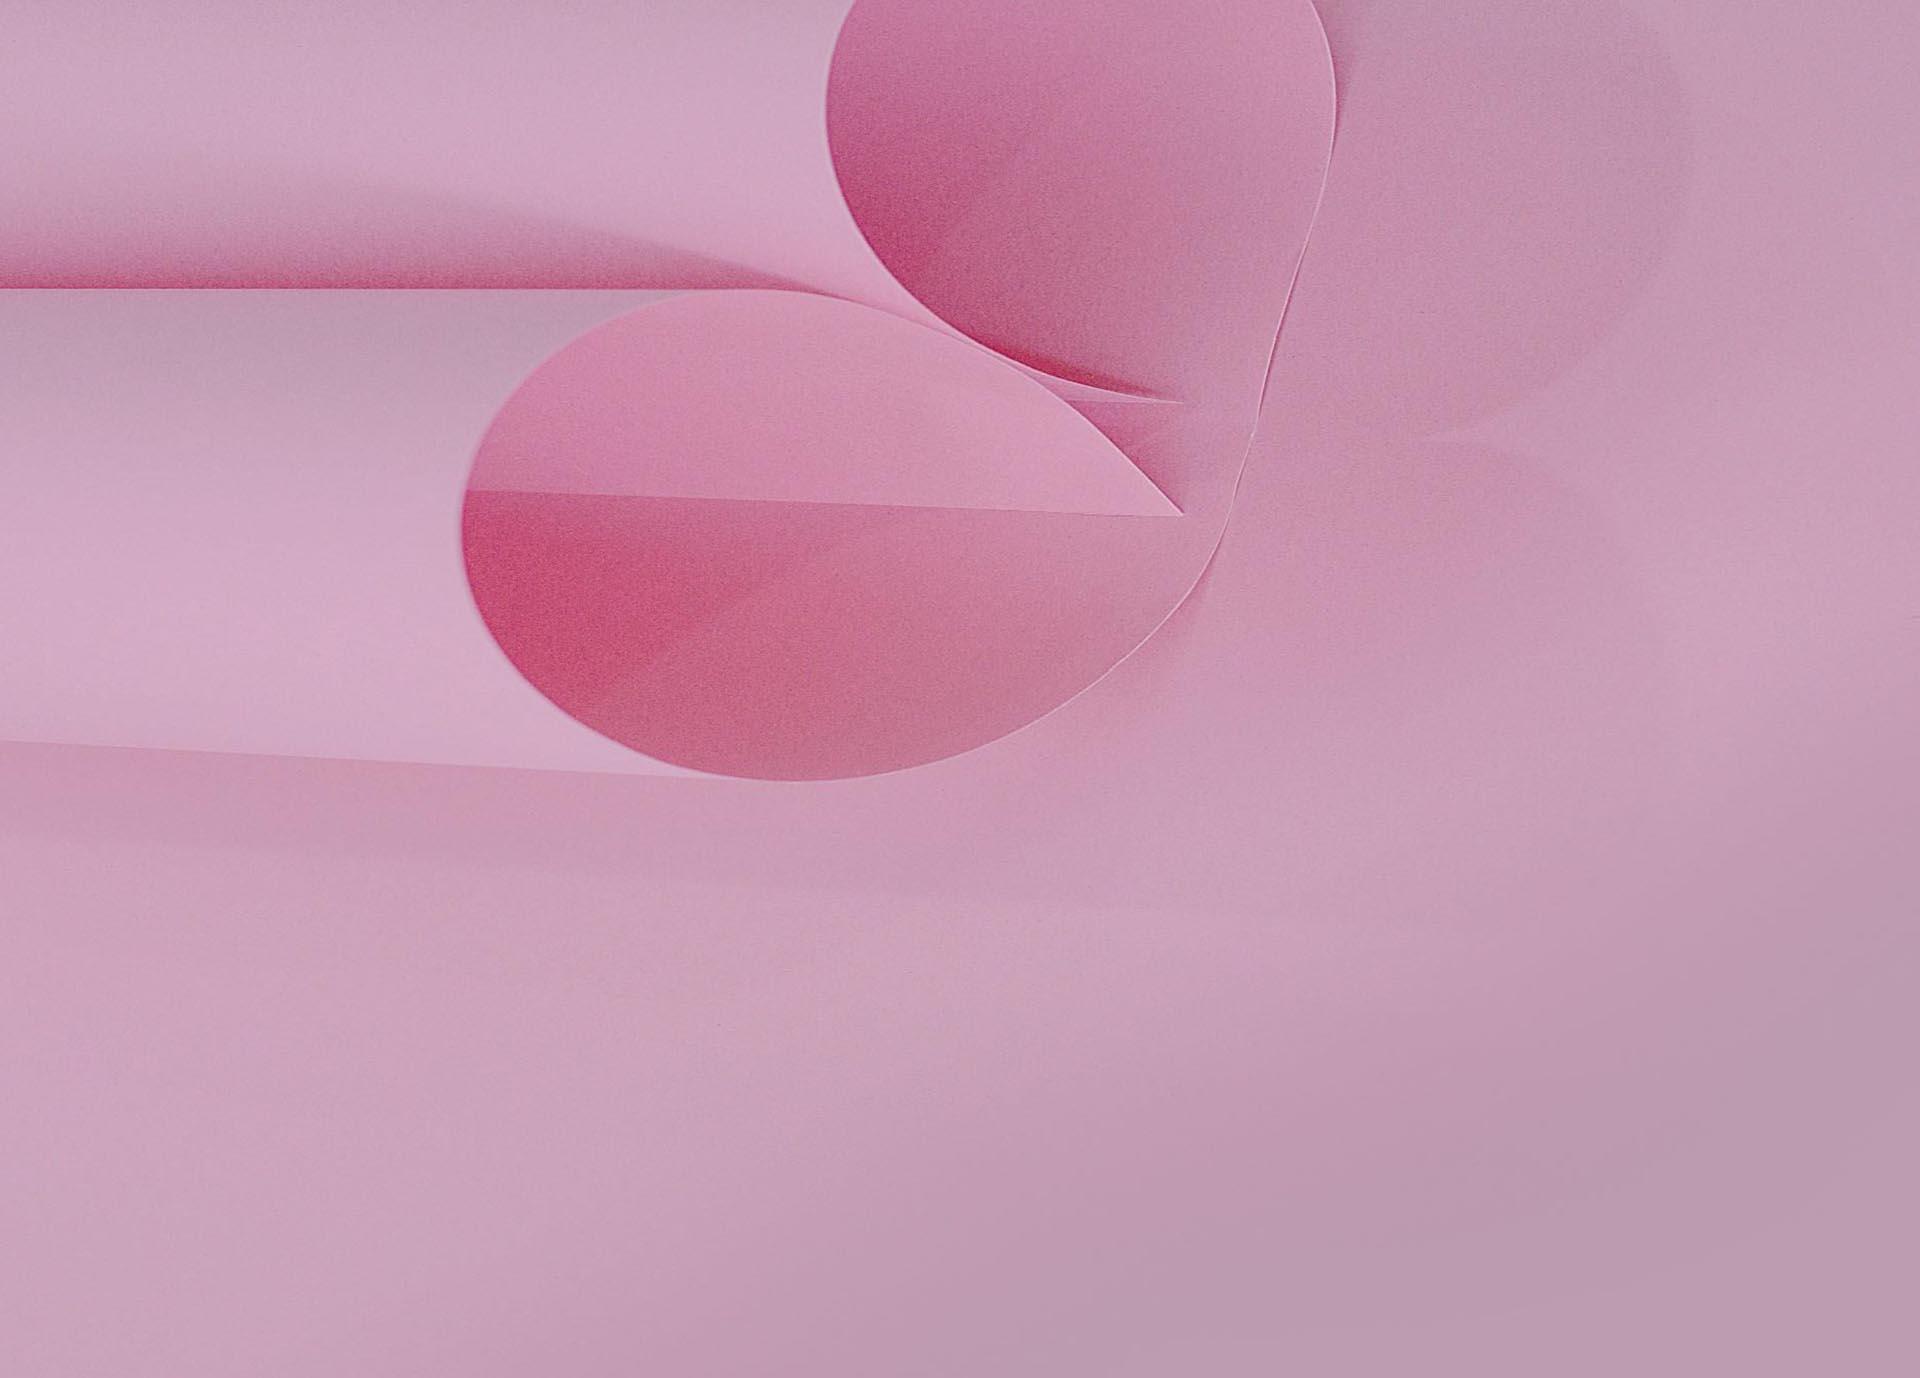 Papel Candy Plus 180g A4 Morango - rosa  - Minas Midias